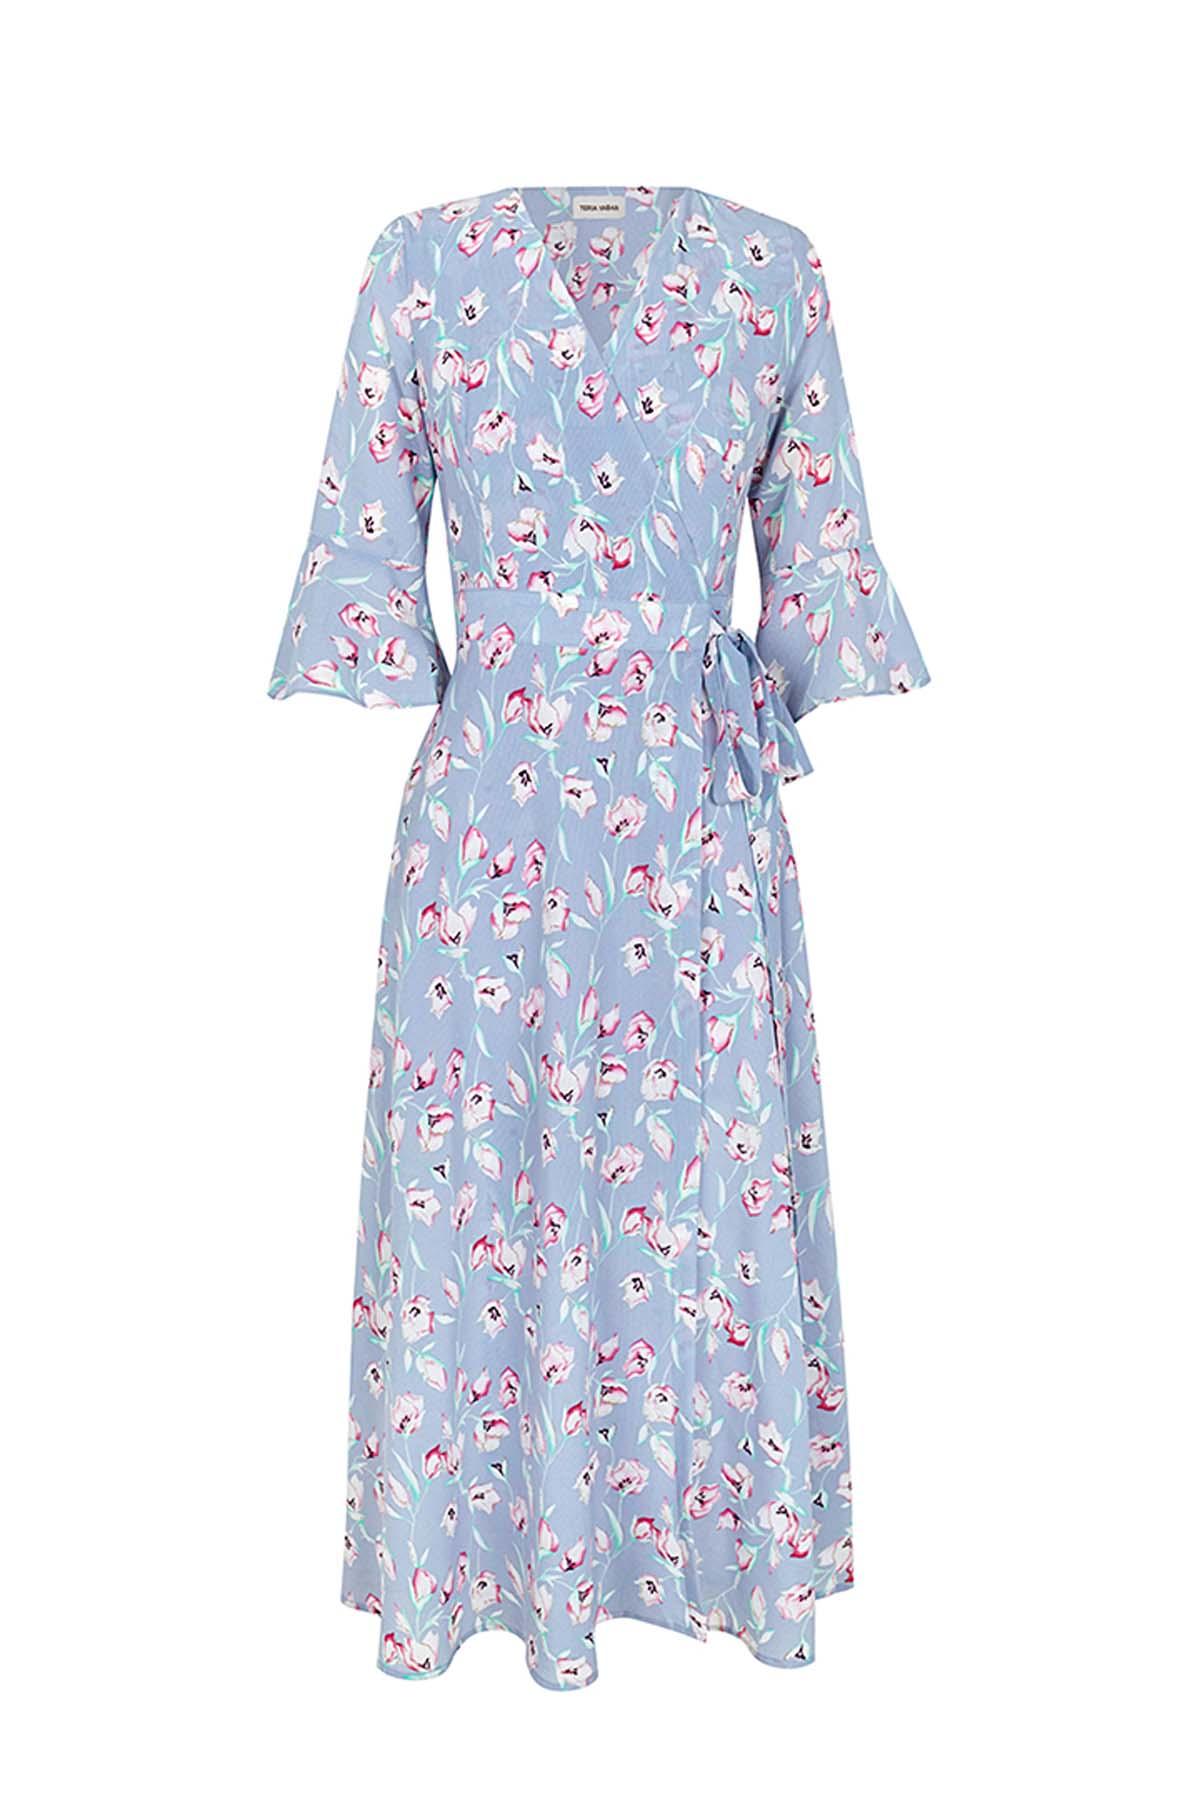 Teria Yabar - Vestido midi azul